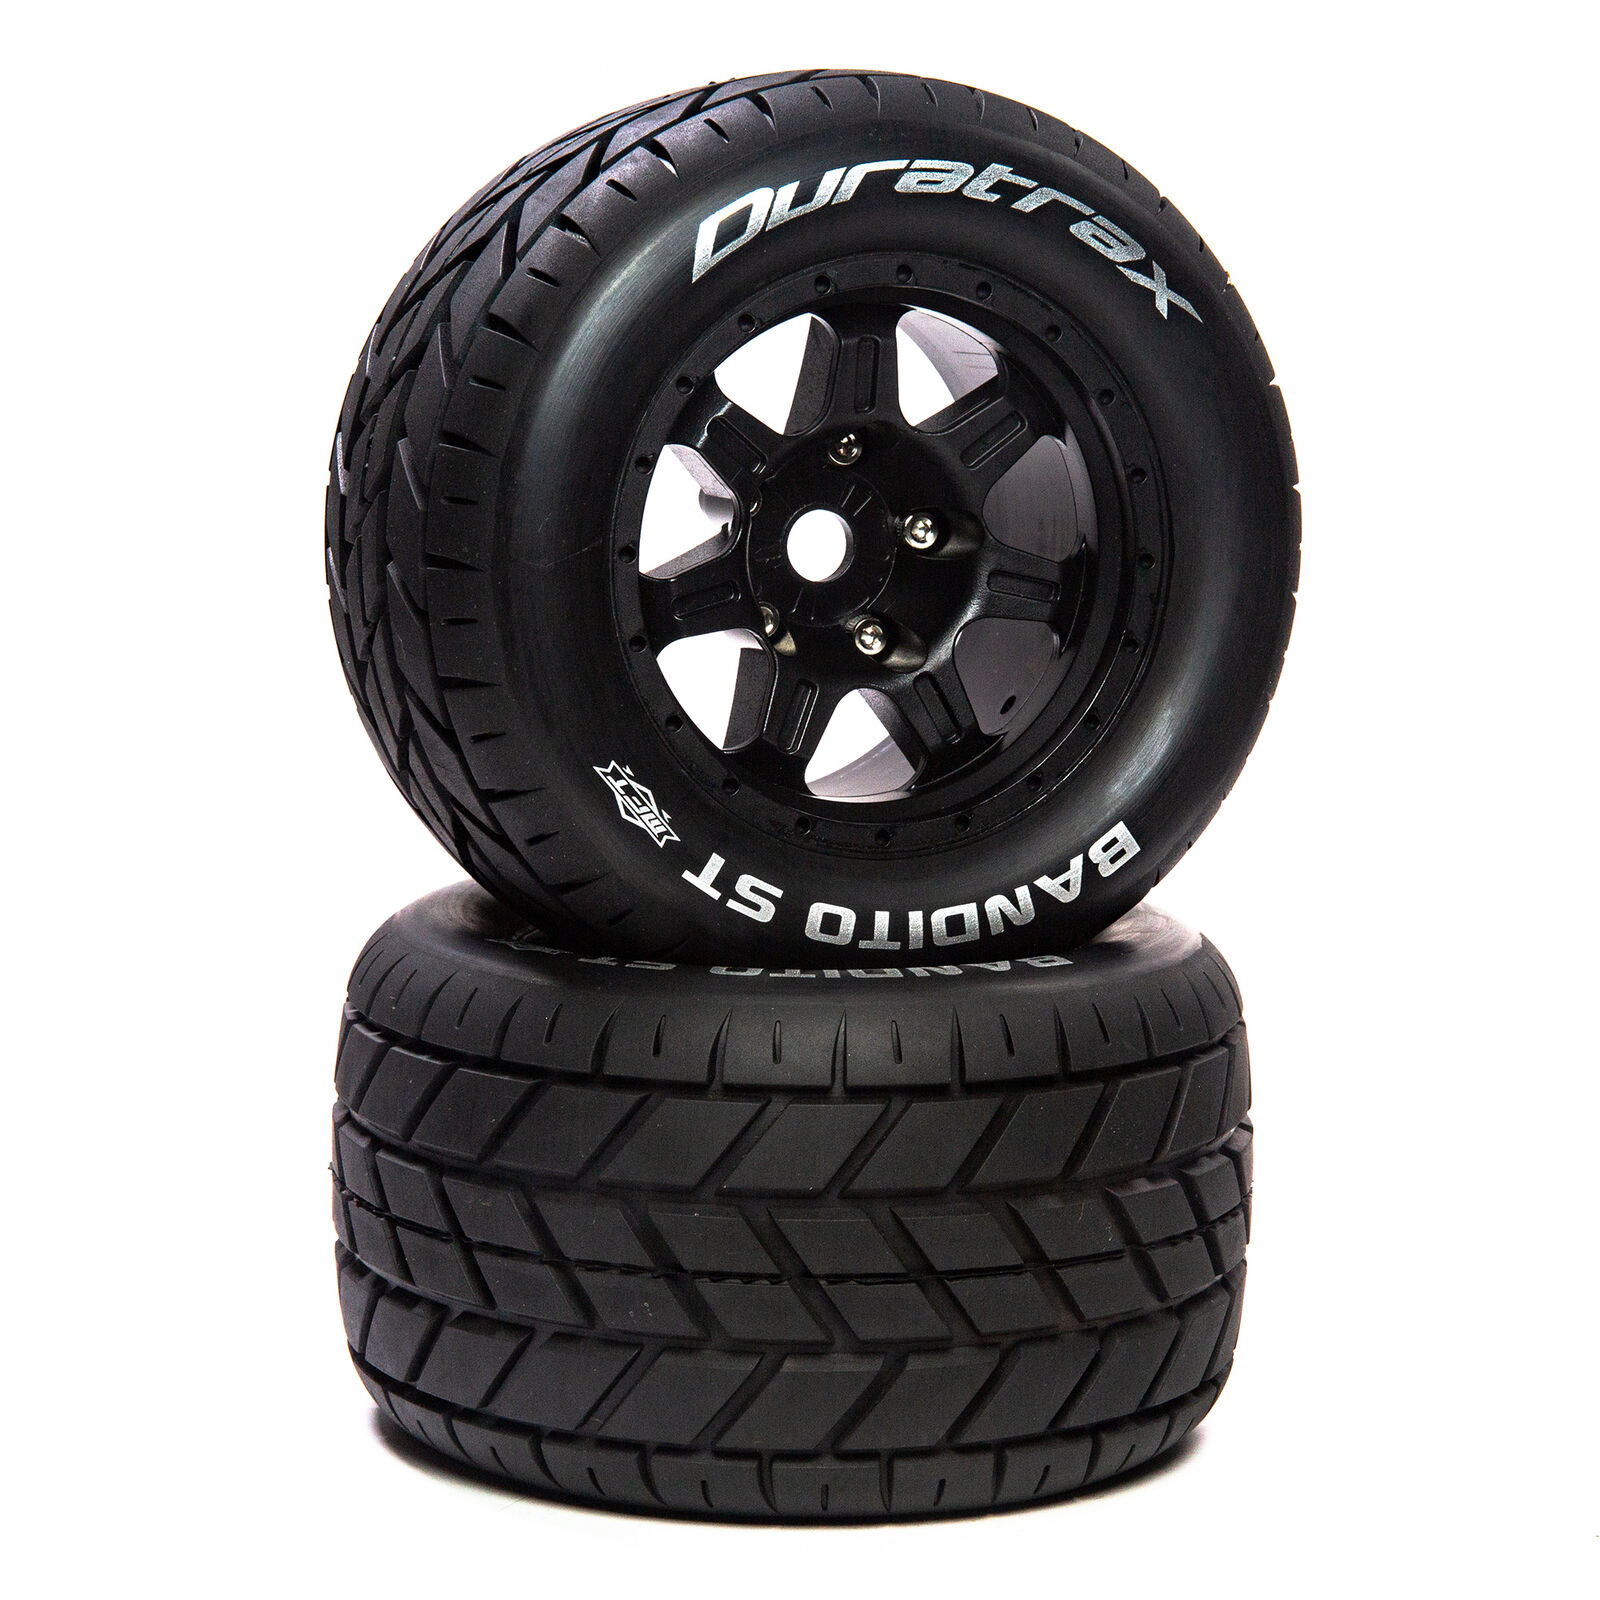 "Bandito ST Belt 3.8"" Mounted Front/Rear Tires .5 Offset 17mm, Black (2)"